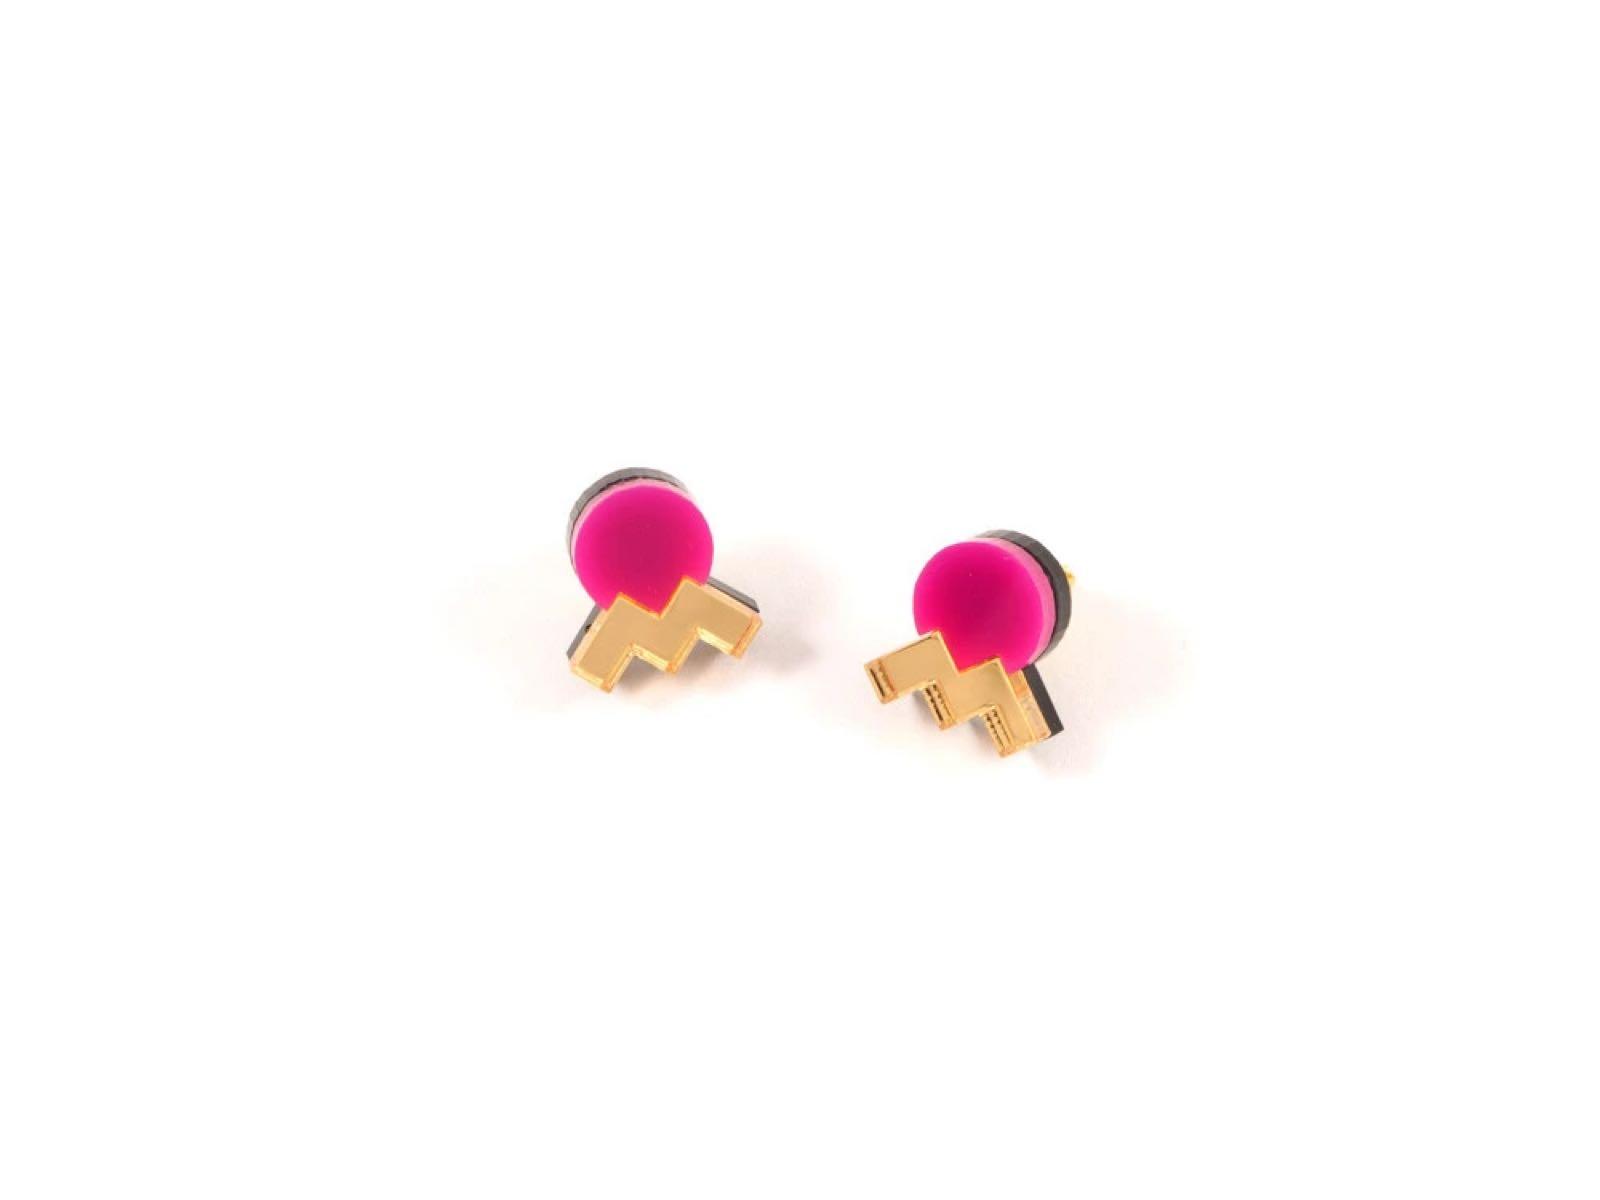 Mystic Forms - Geometric Statement Mini Earrings